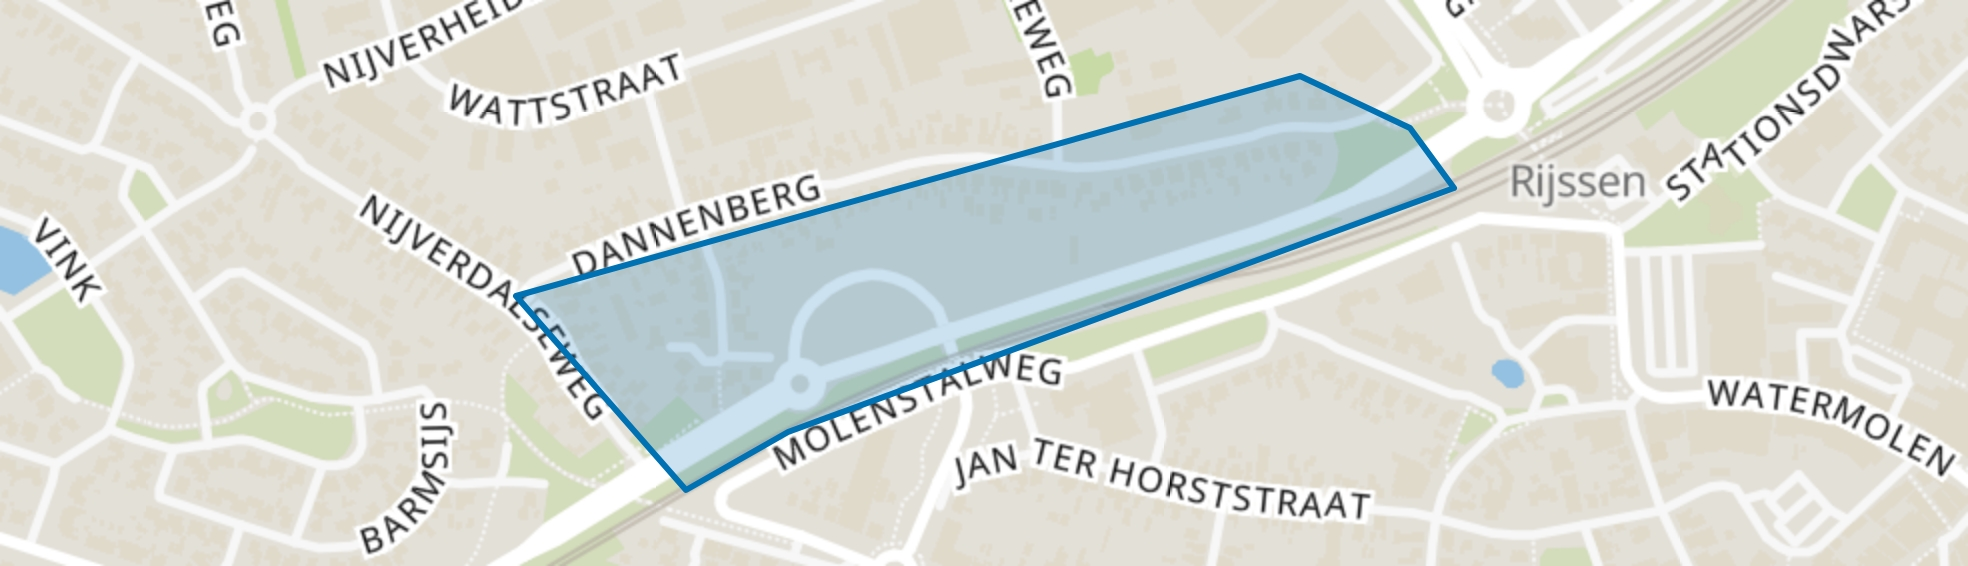 Dannenberg, Rijssen map